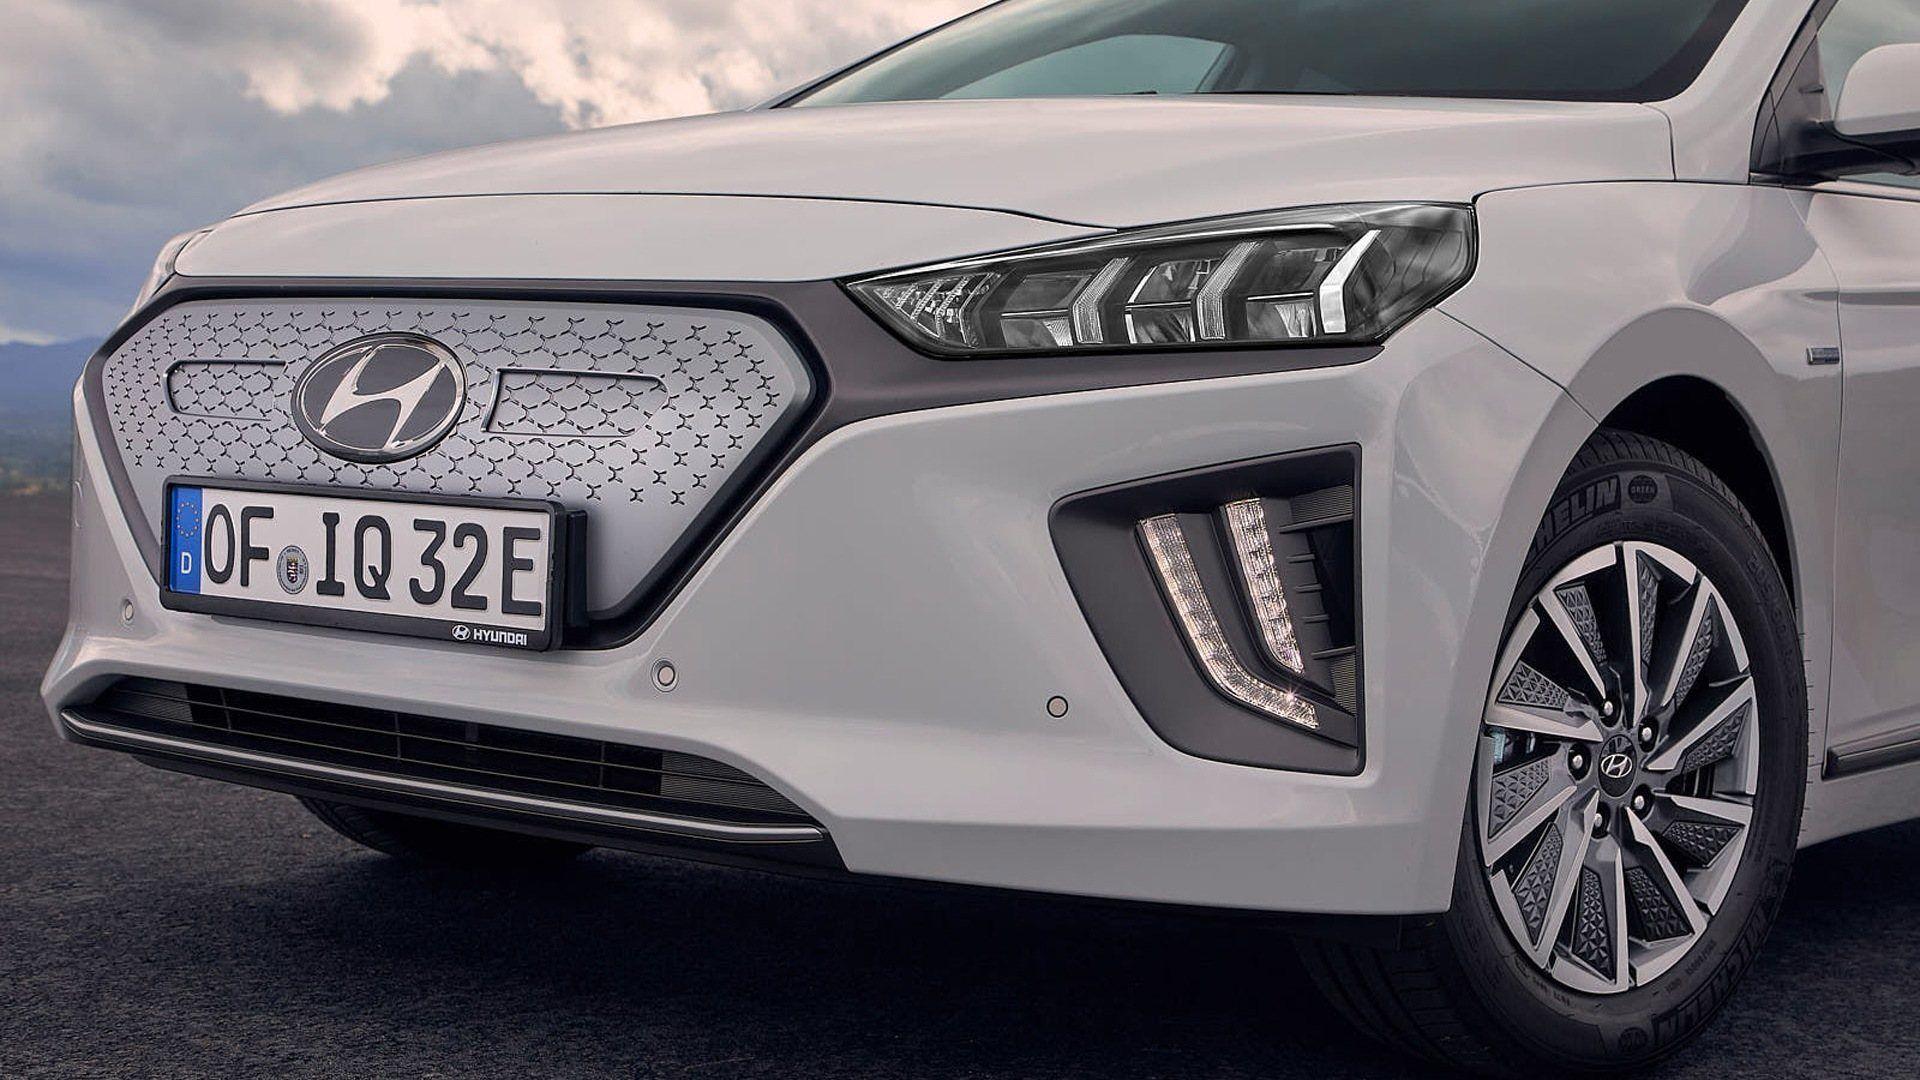 2020 Hyundai I20 Specs And Review In 2020 Hyundai New Hyundai New Cars